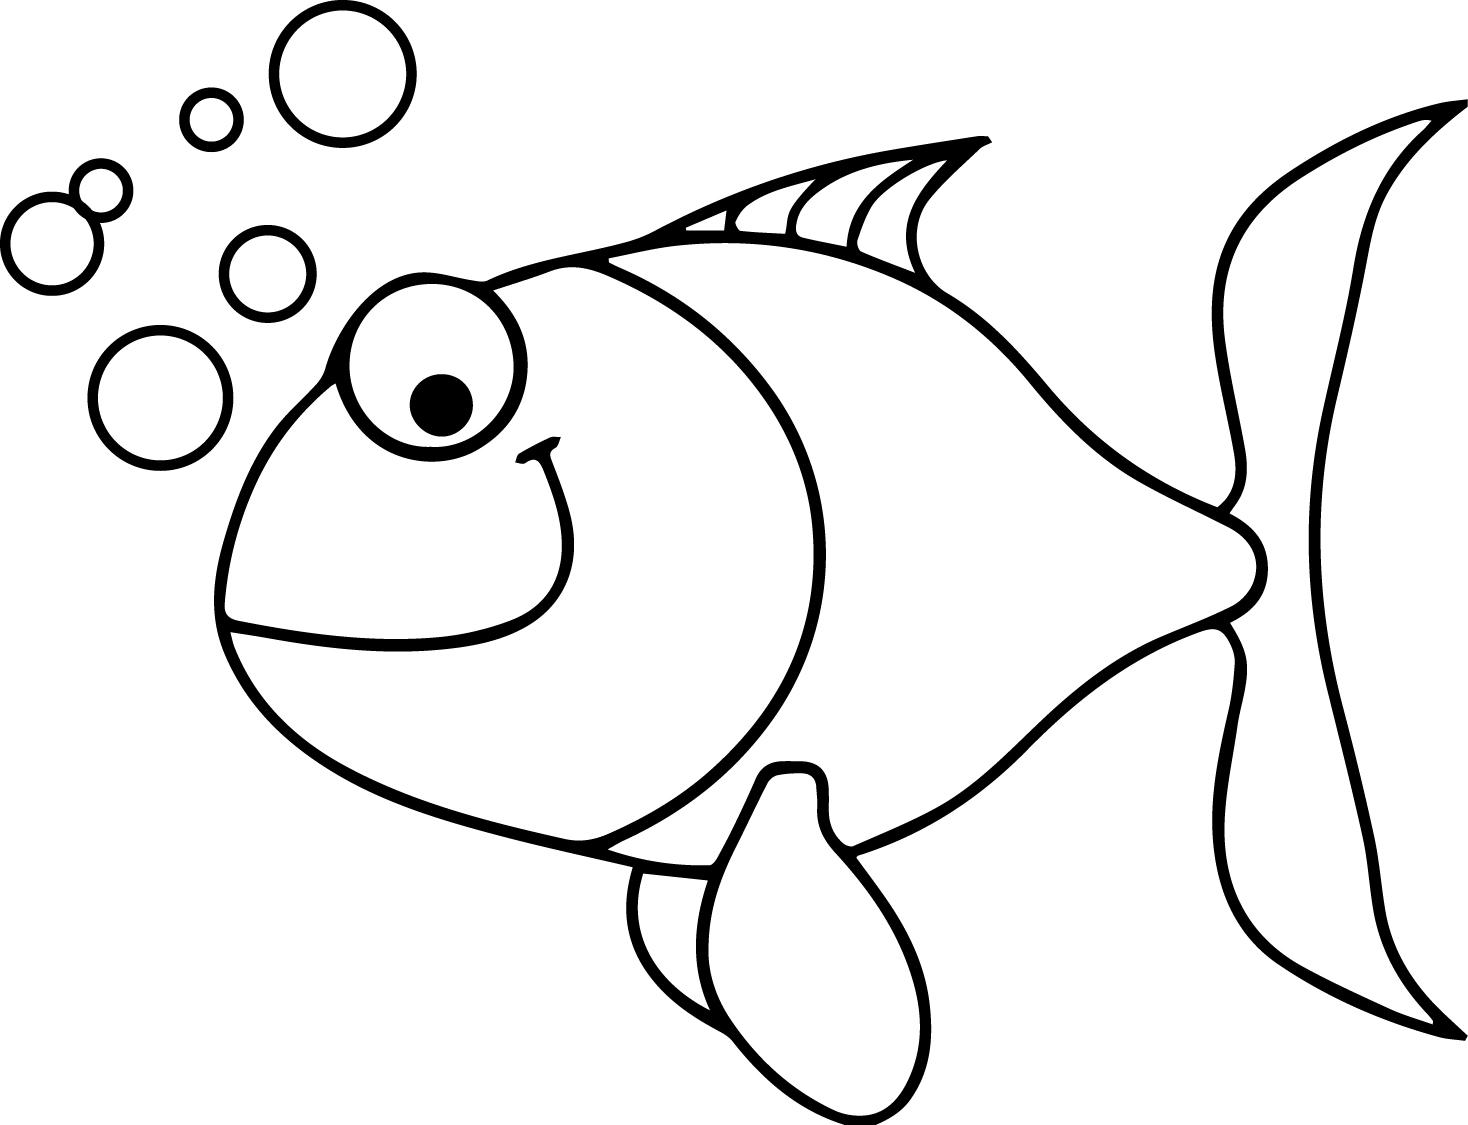 Under Water Cartoon Fish Coloring Page Sheet